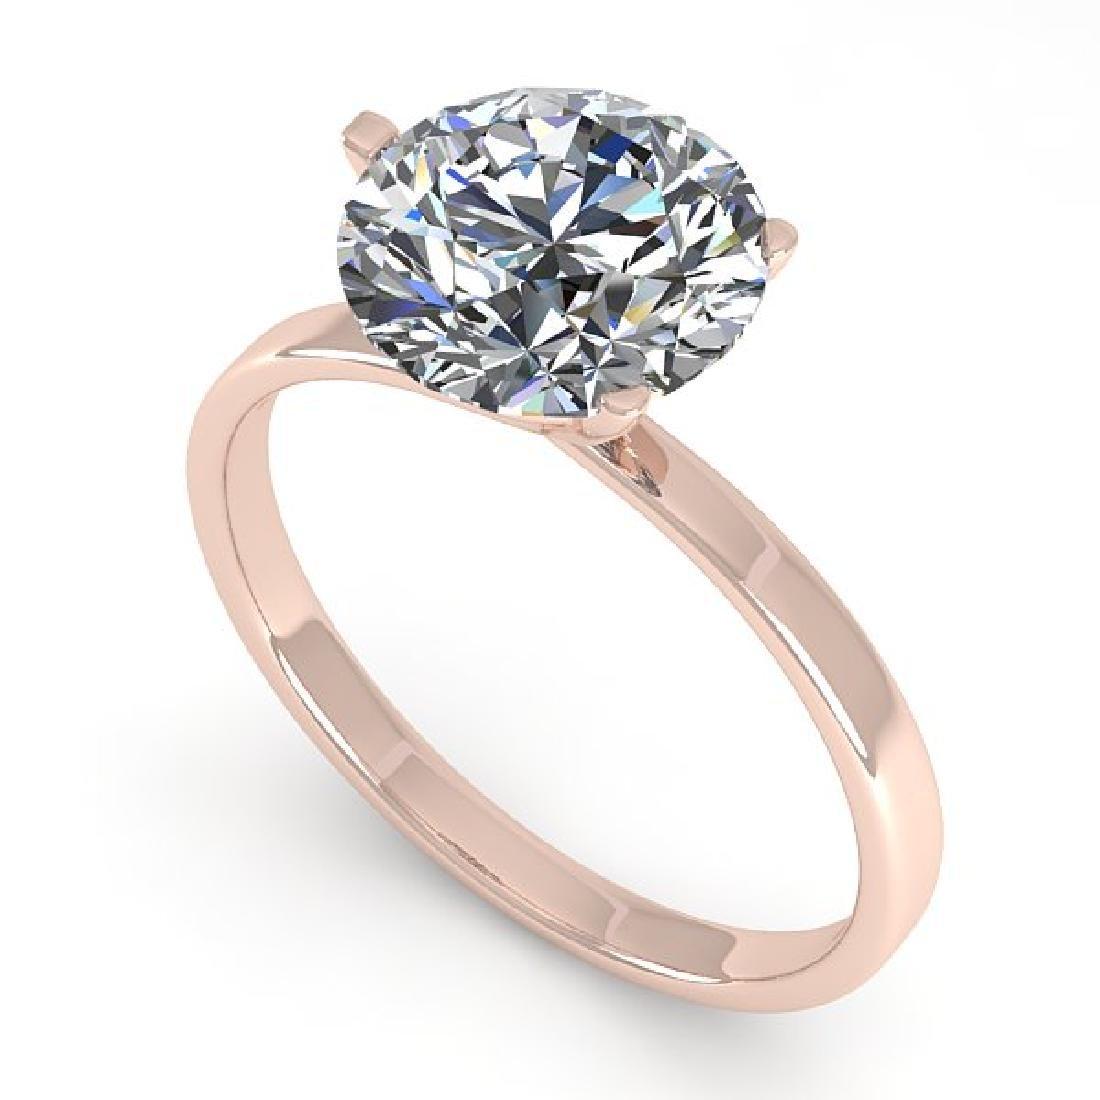 2.01 CTW Certified VS/SI Diamond Engagement Ring 18K